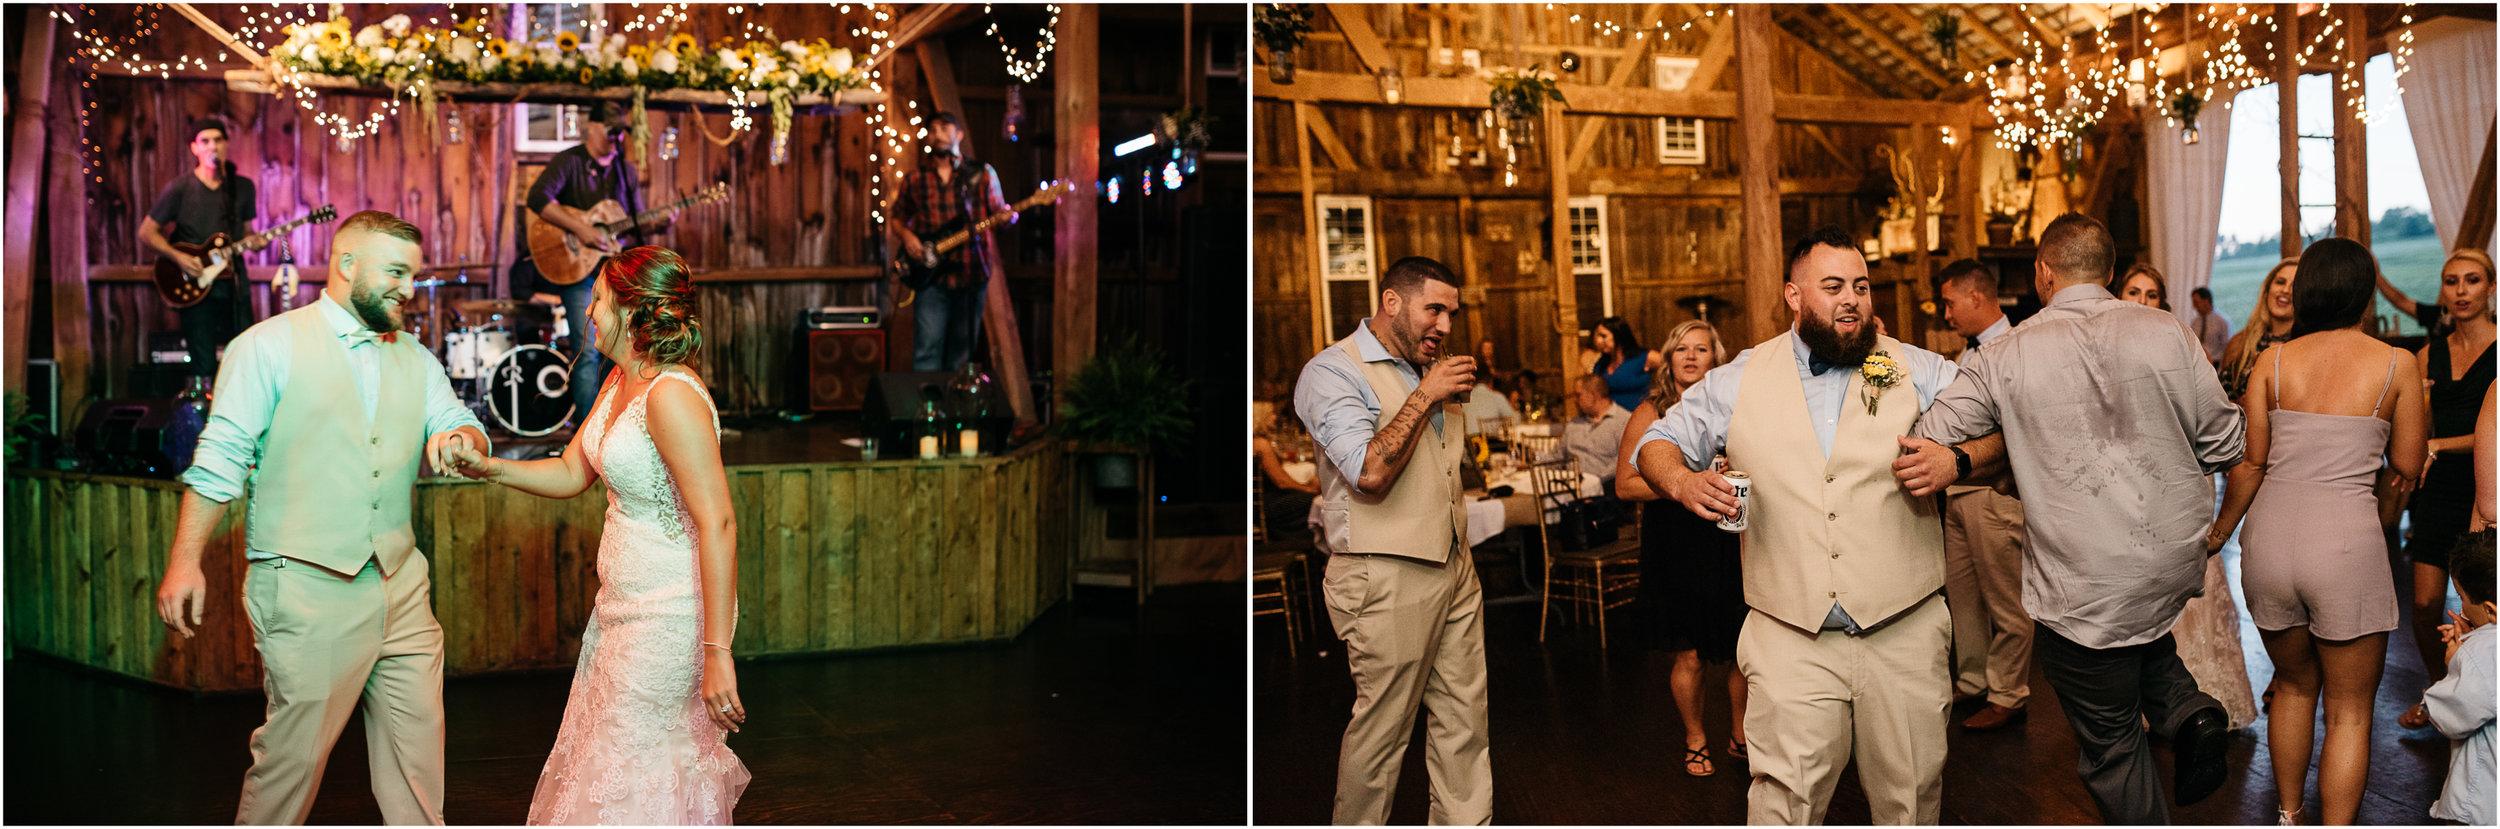 reception dancing, The Hayloft of PA.jpg